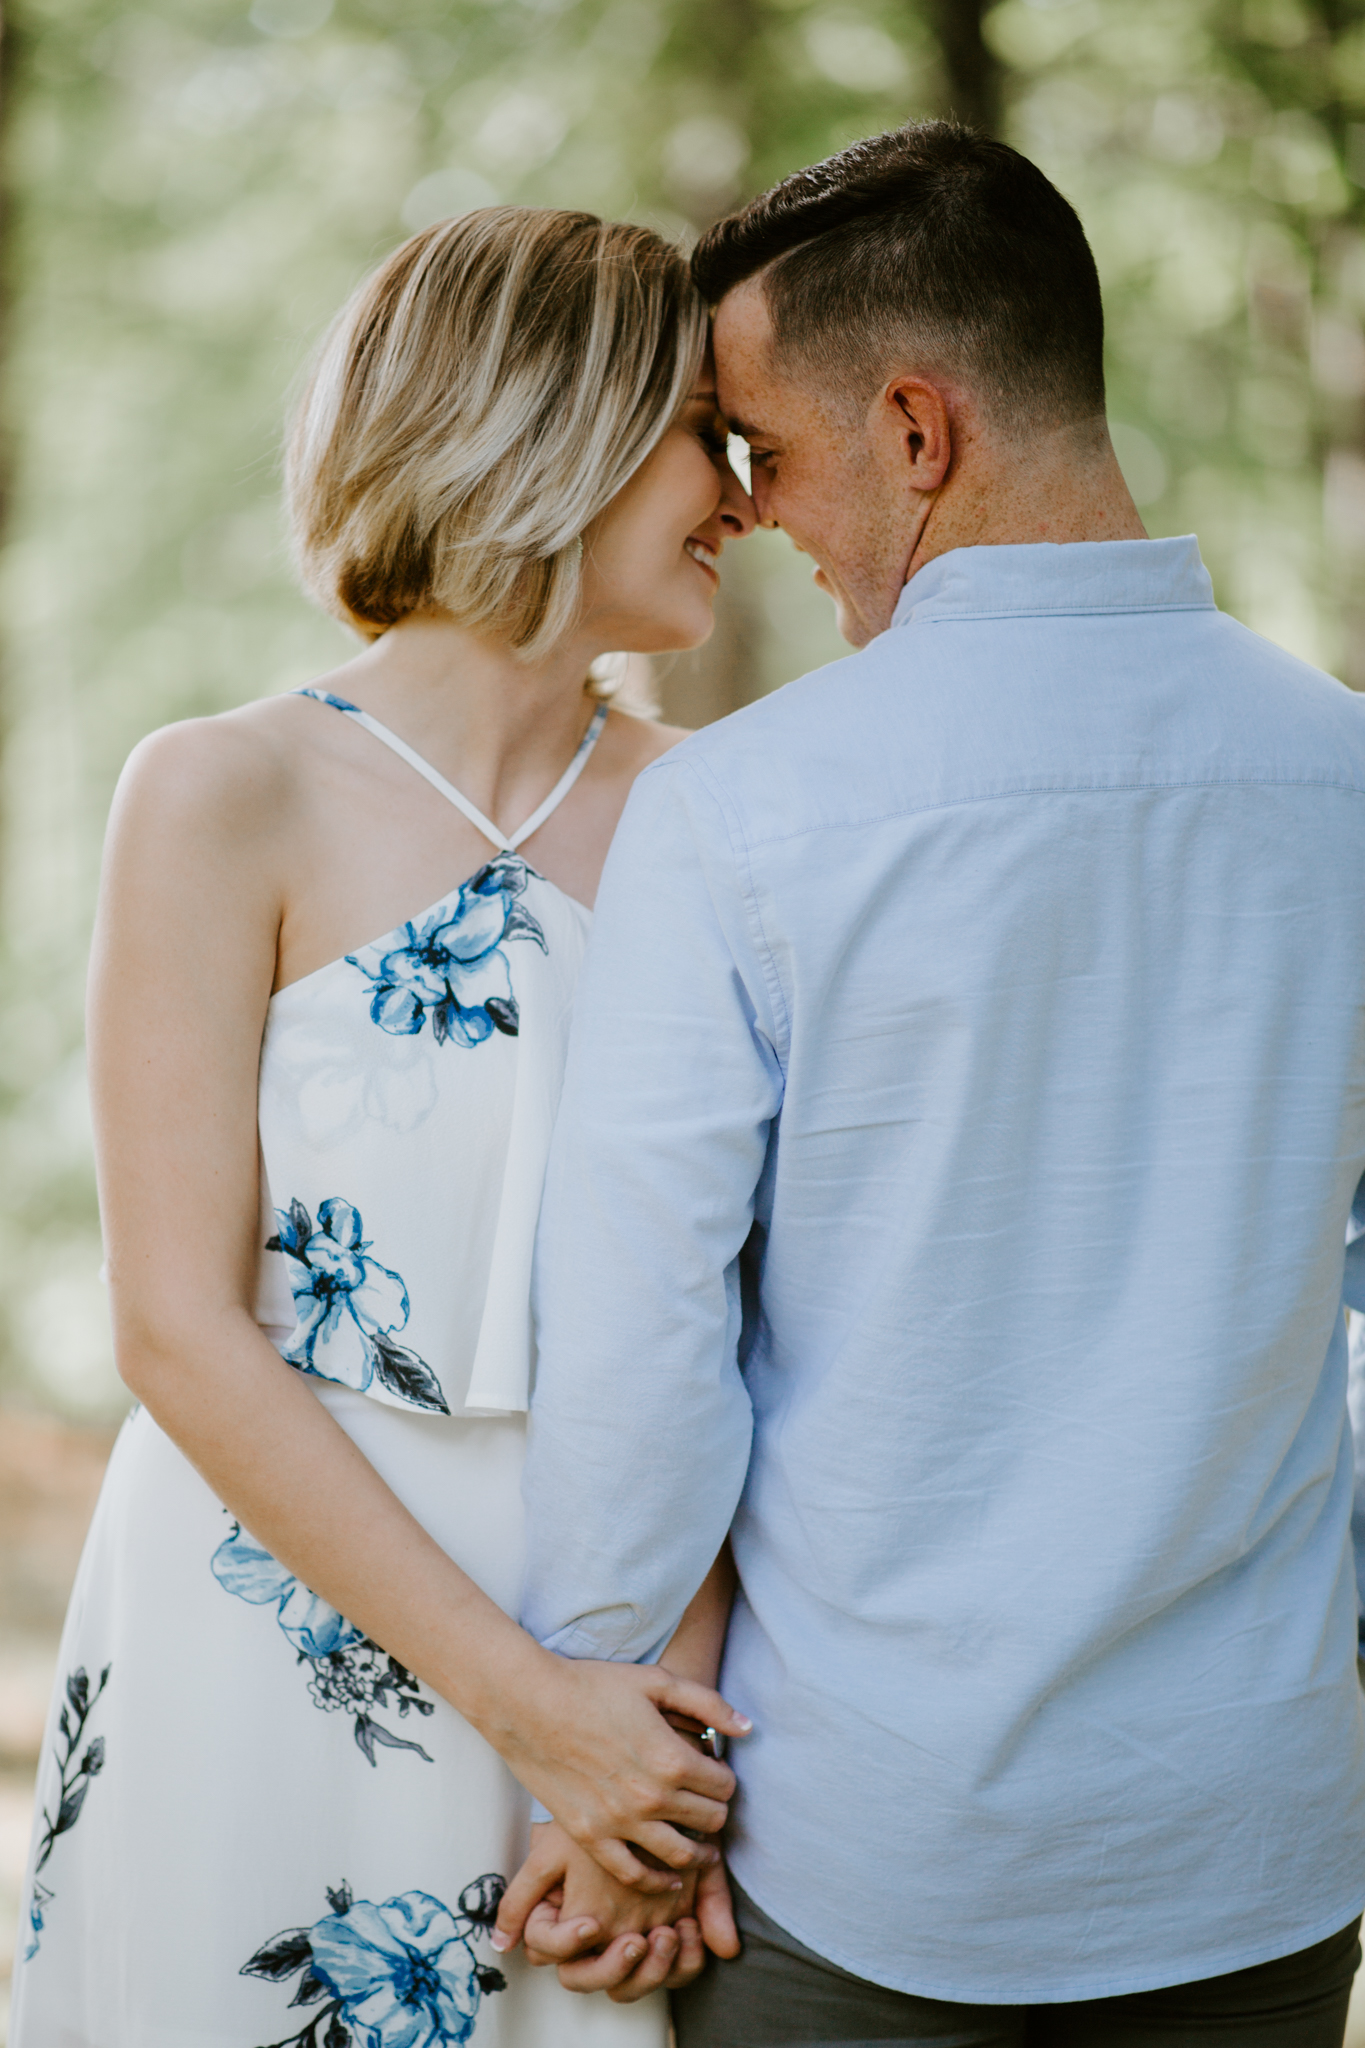 Courtney-Jordan-Chattanooga-Nashville-Tennessee-Wedding-Elopement-Photographer-83.jpg